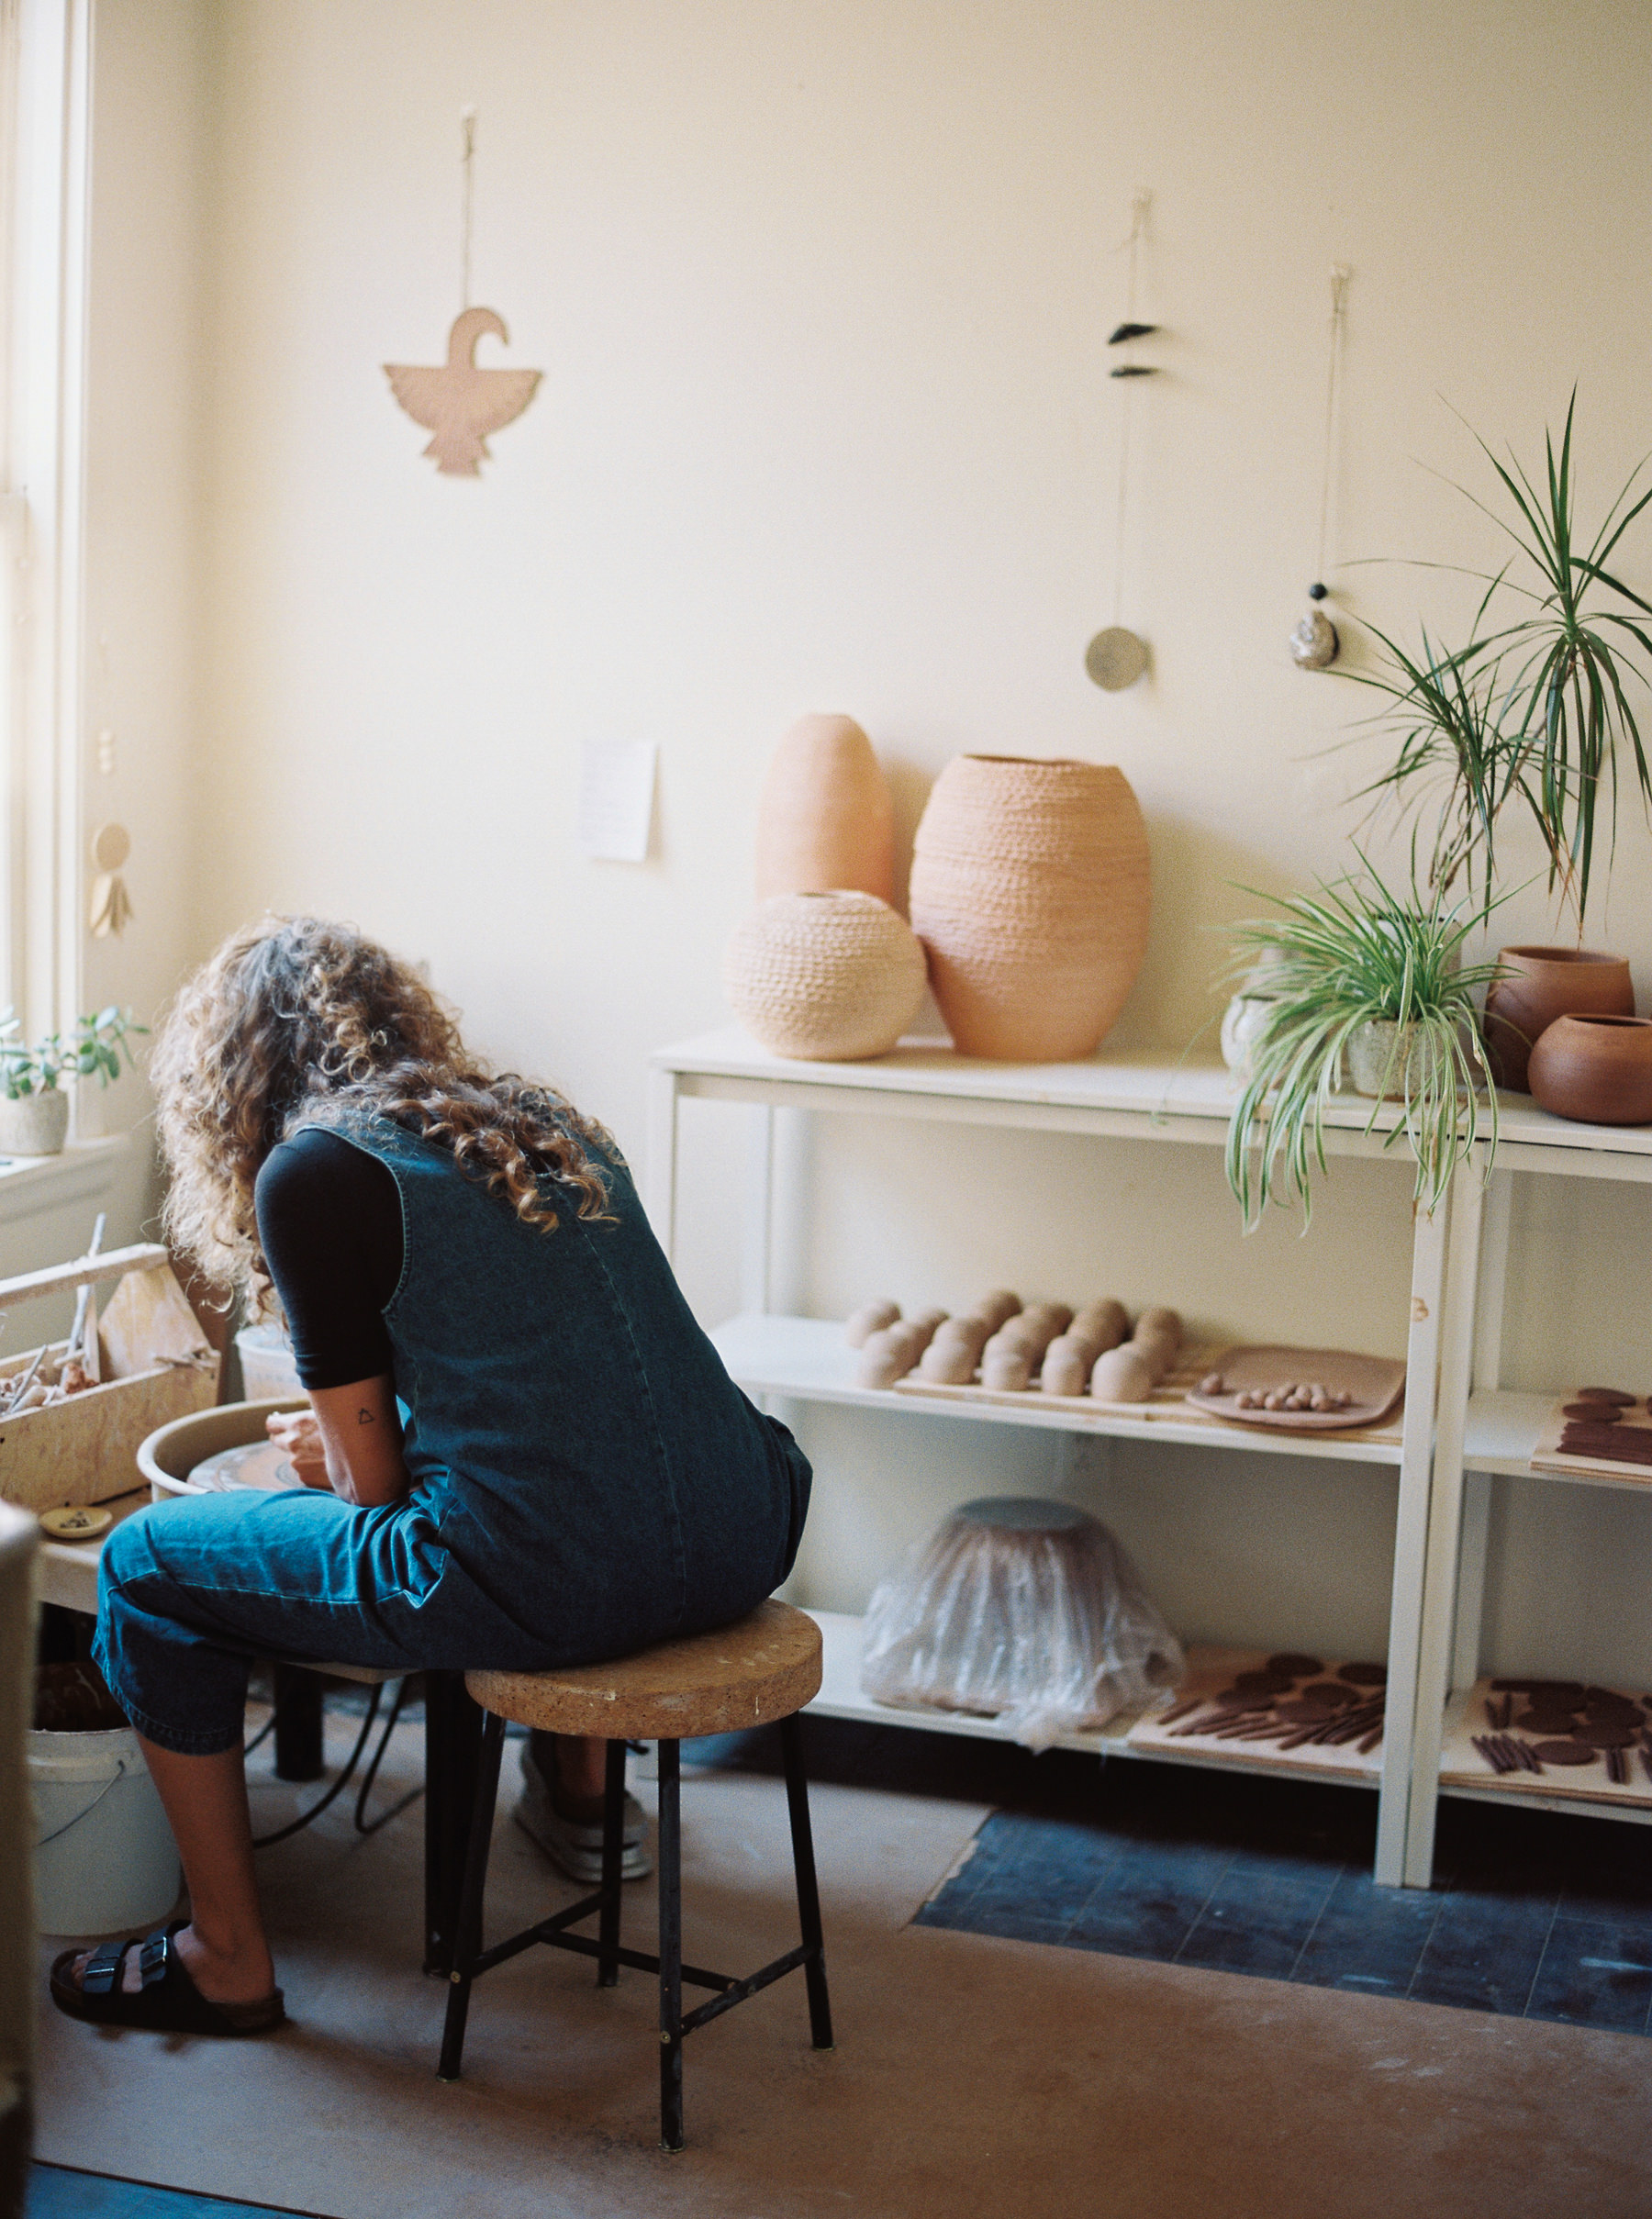 artistprofile-katherinemoes-pottery-annapeters-annapetersphoto-unearthing.tc-46.jpg